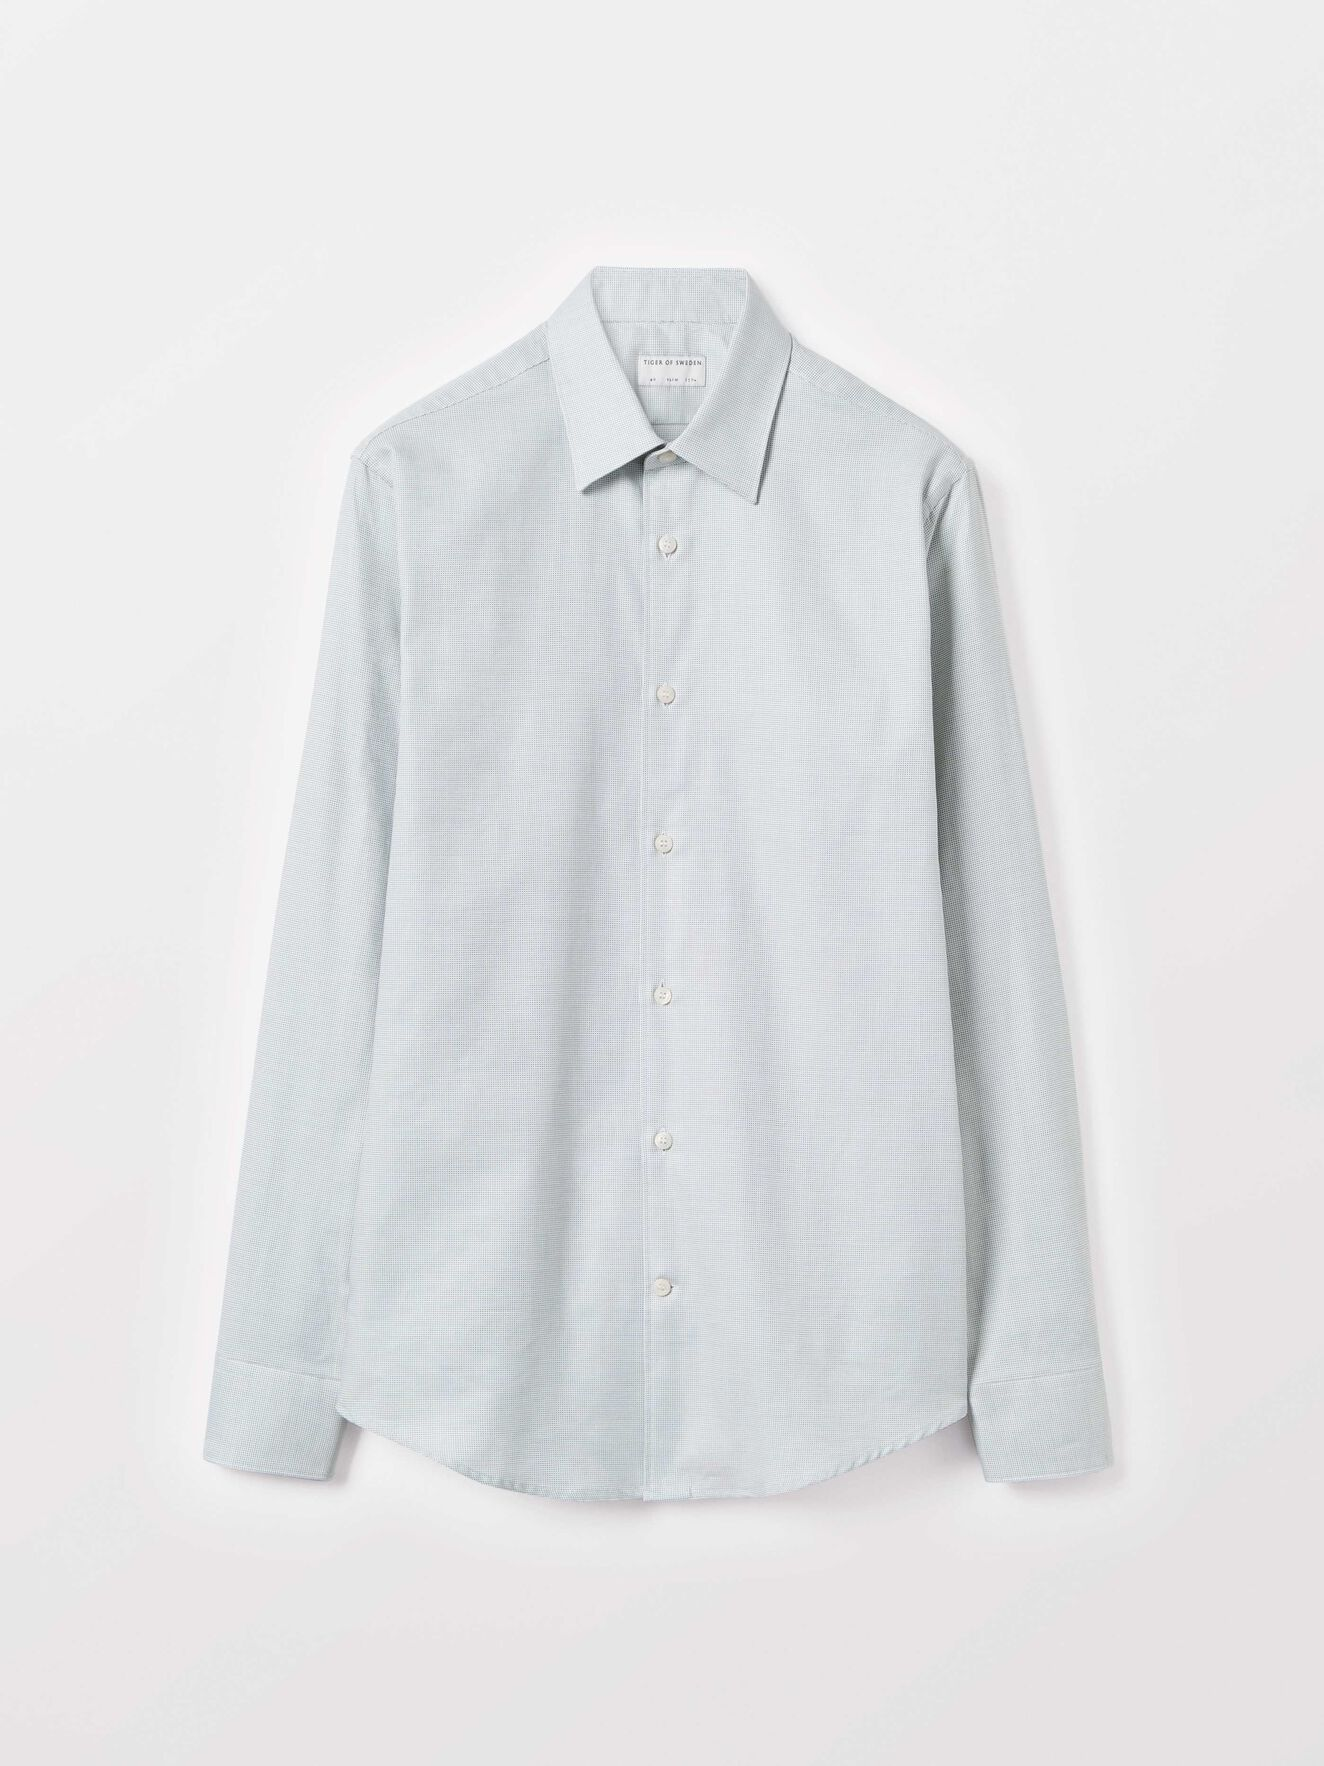 Farrell Shirt in Kalamata from Tiger of Sweden